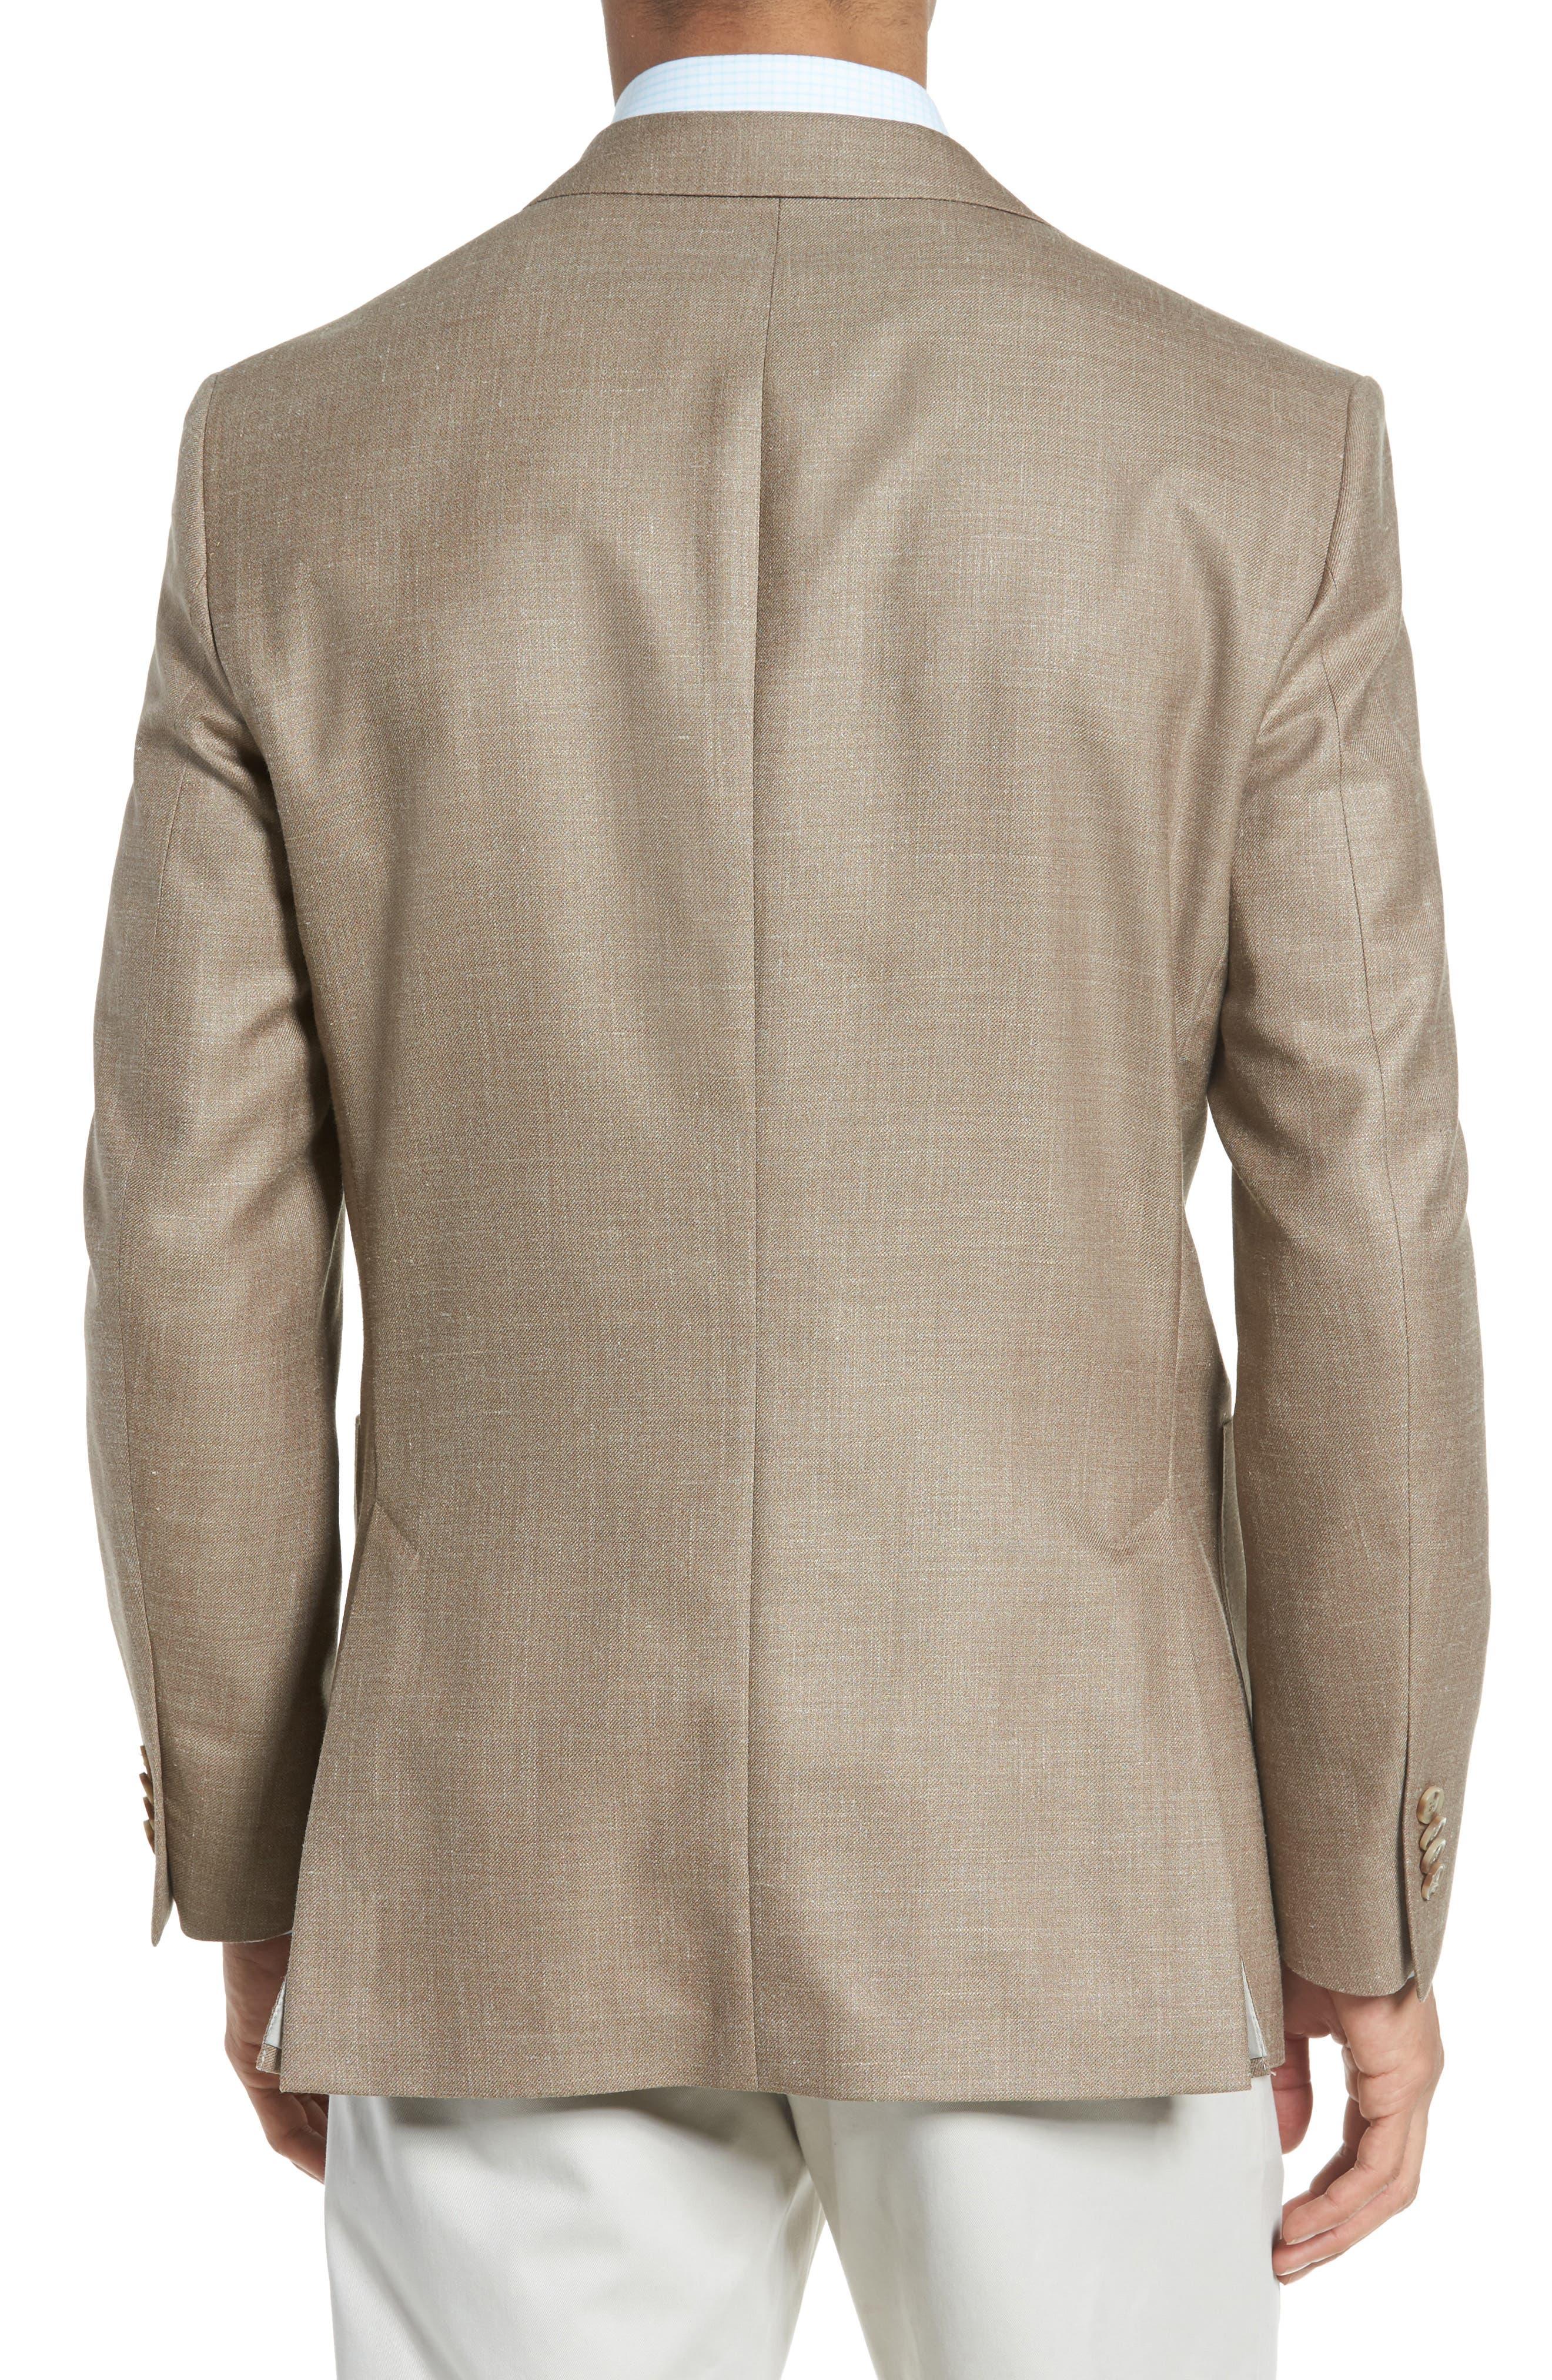 Classic Fit Wool Blend Blazer,                             Alternate thumbnail 2, color,                             Tan